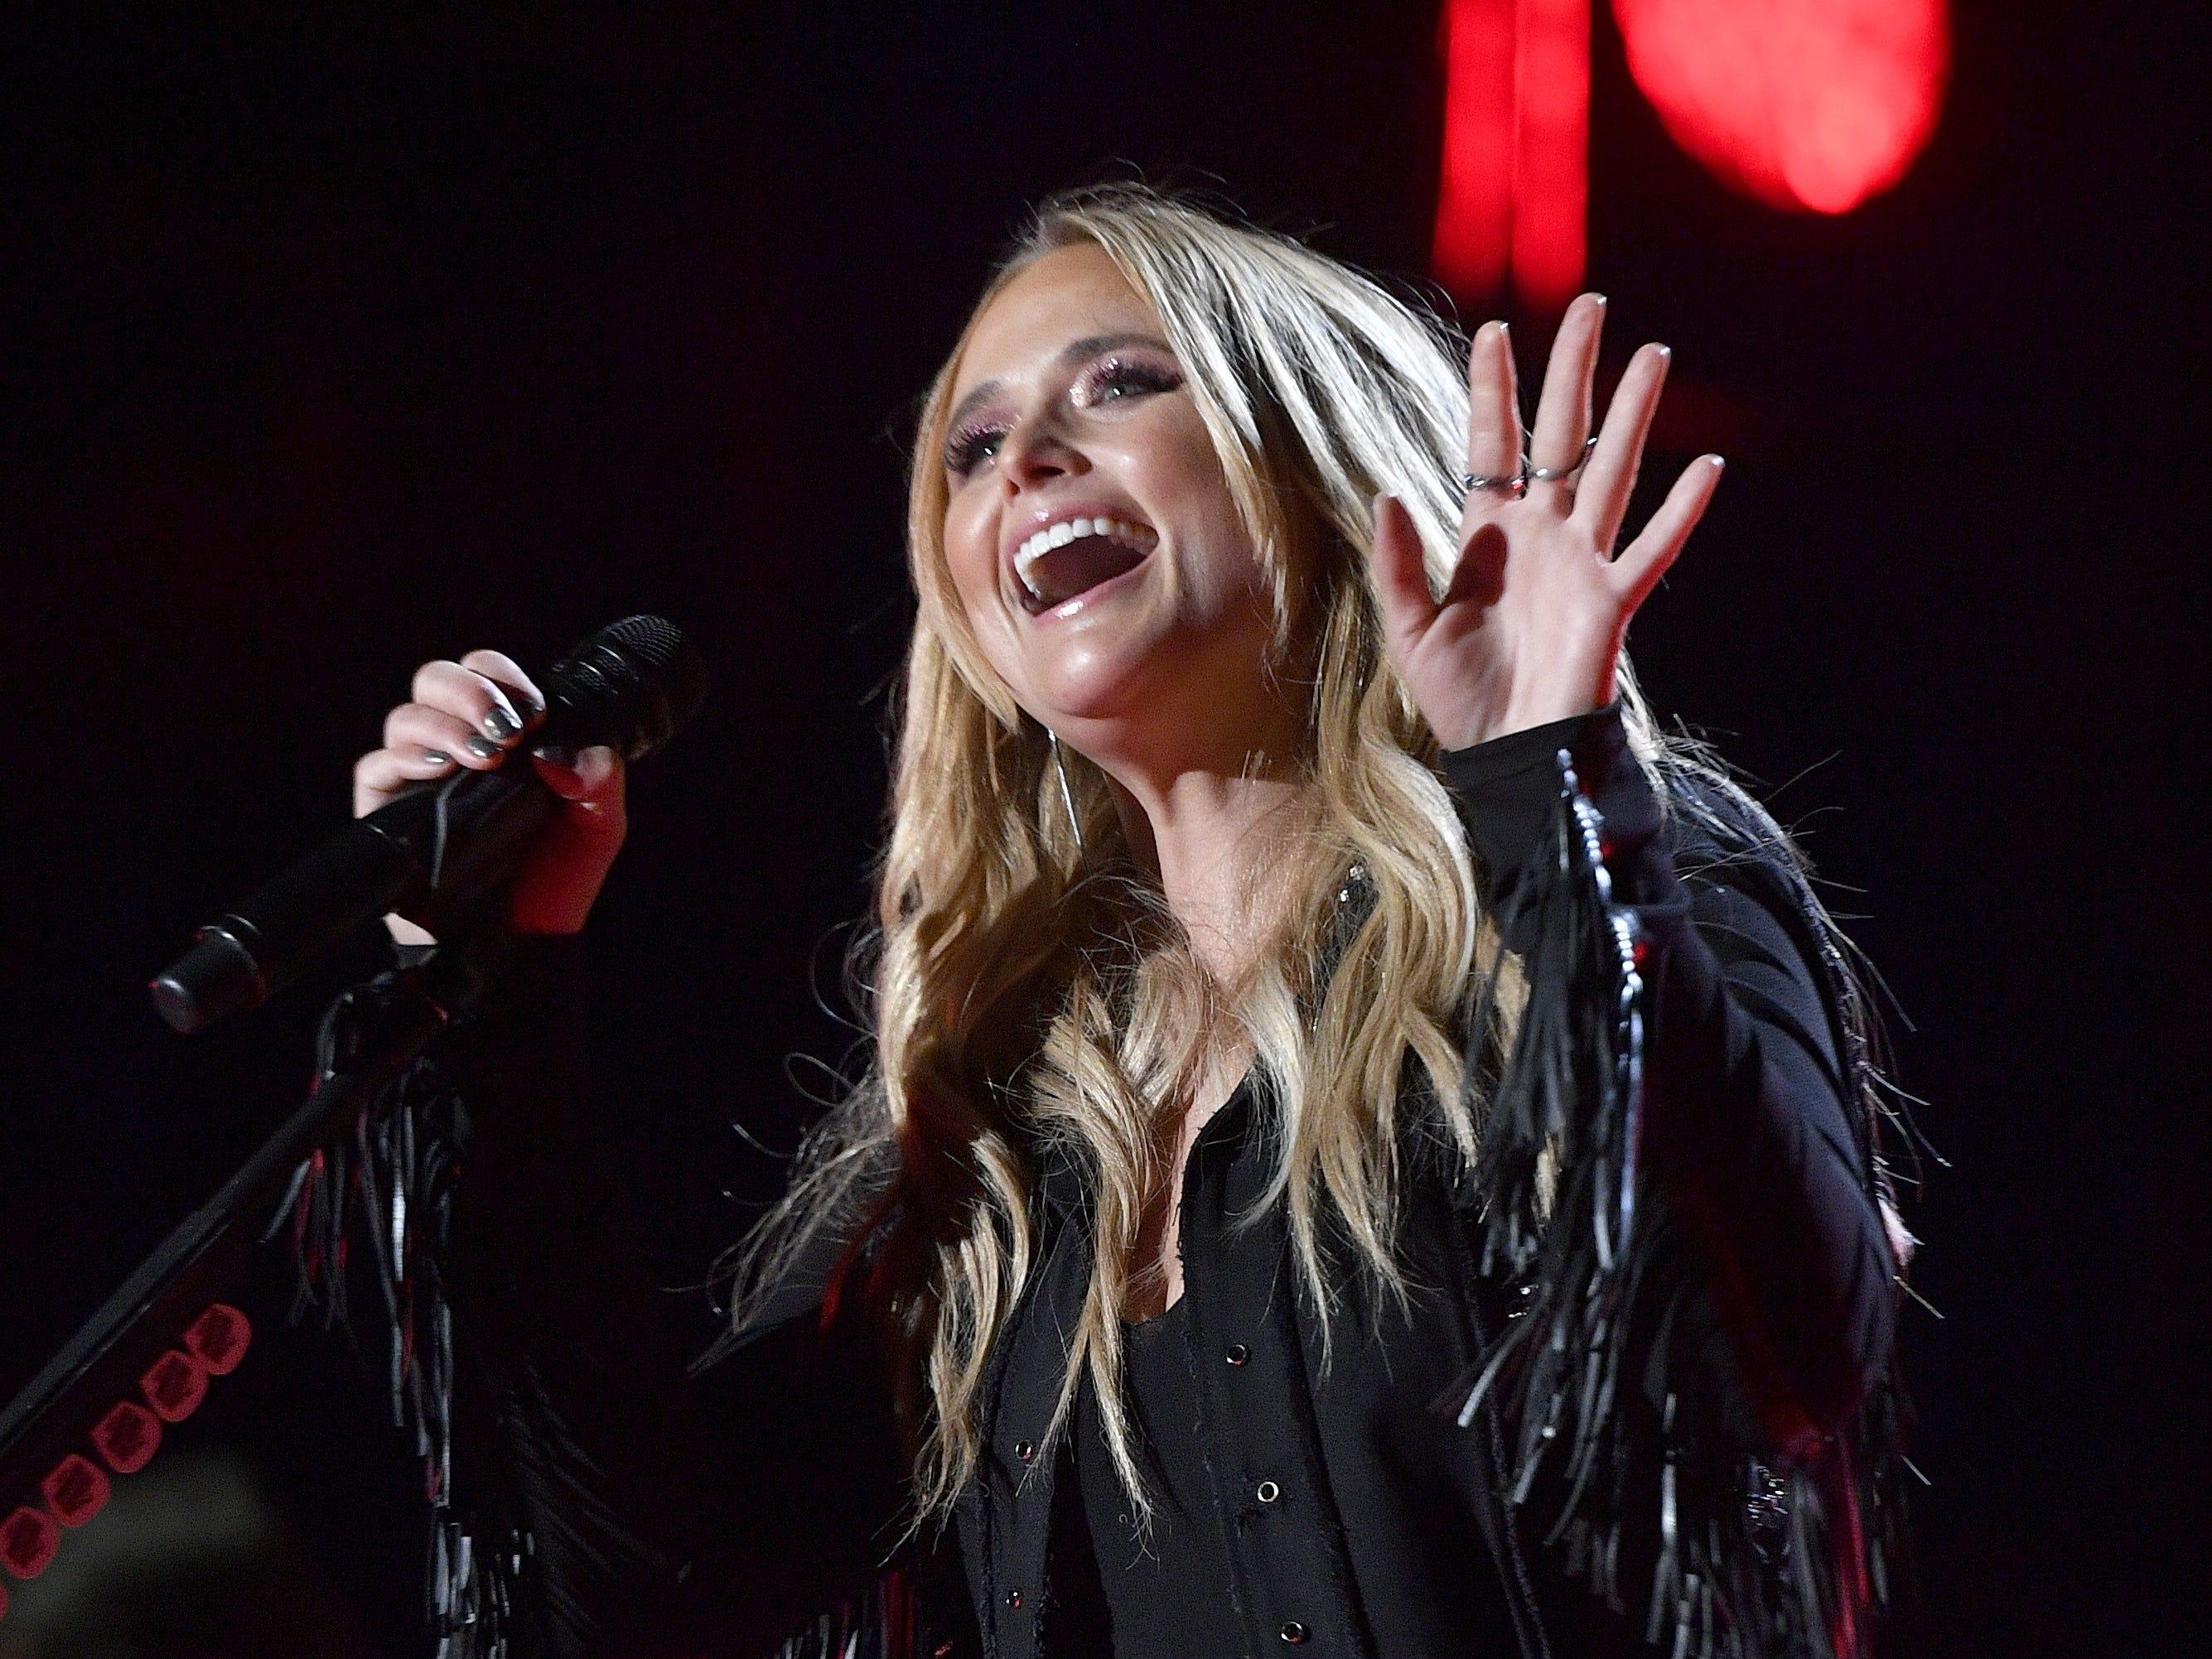 Miranda Lambert is scheduled to play Nissan Stadium during CMA Fest 2019.